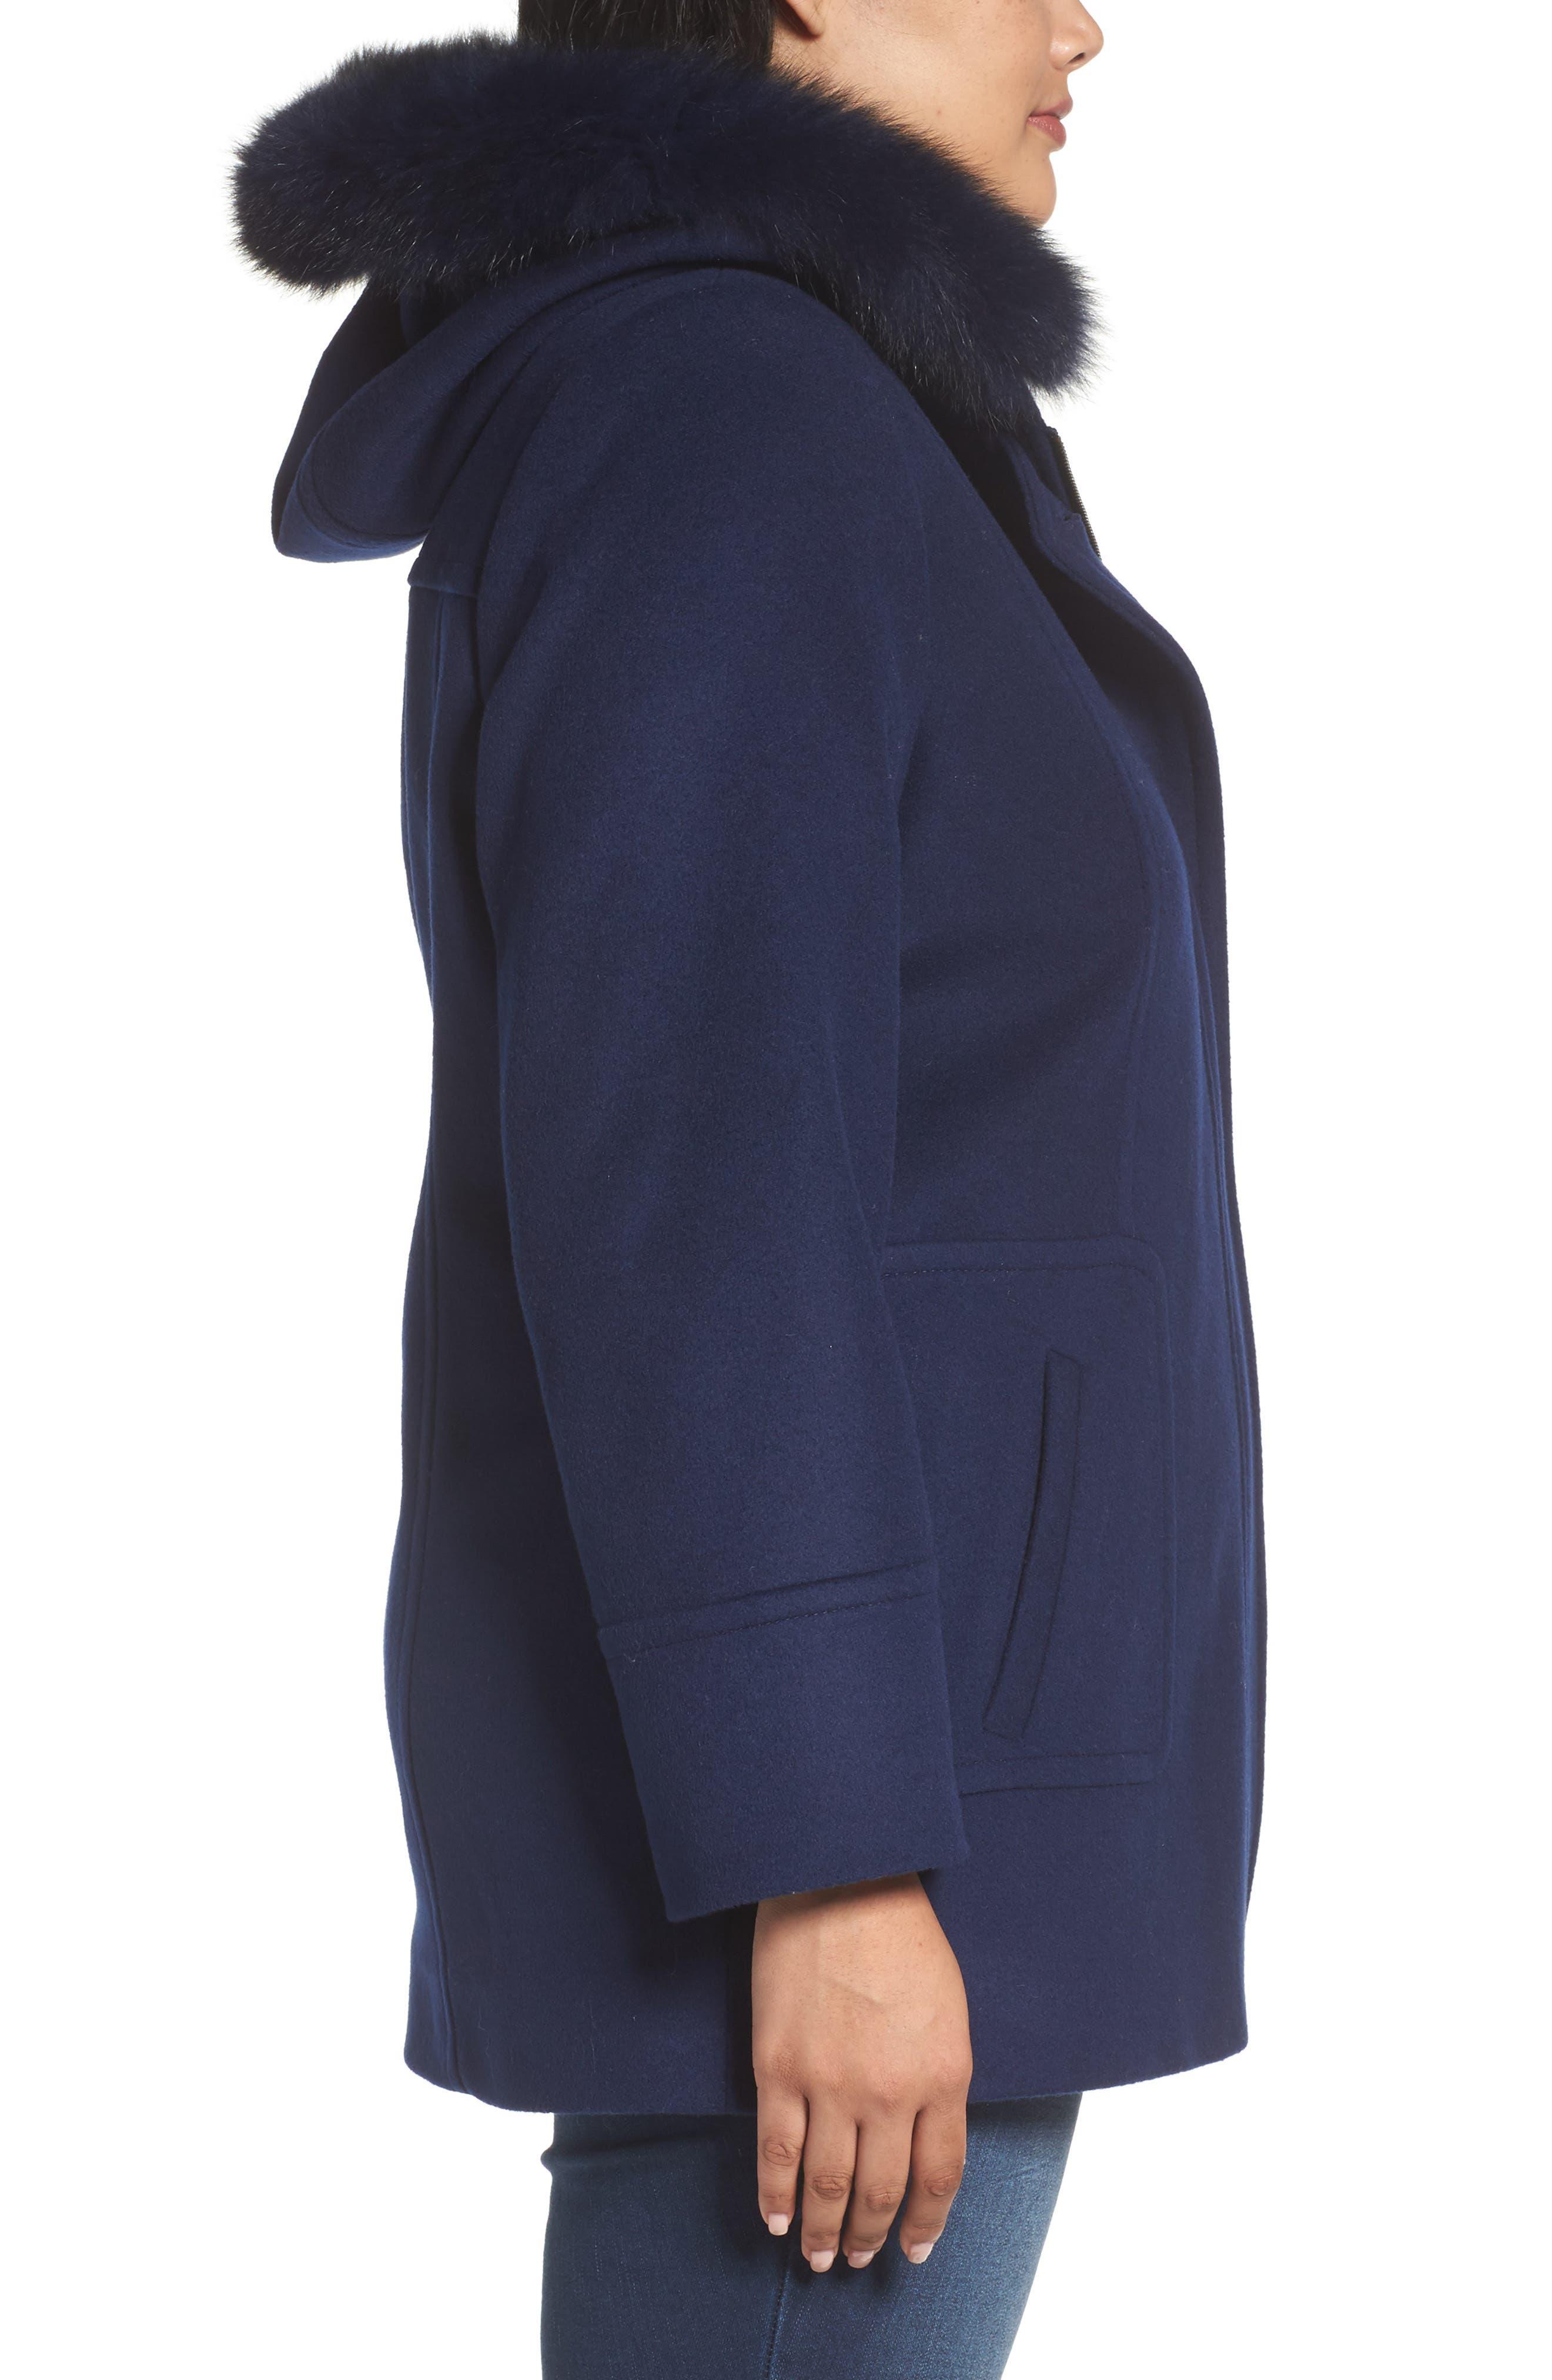 Alternate Image 3  - Sachi Hooded Wool Blend Coat with Genuine Fox Fur Trim (Plus Size)